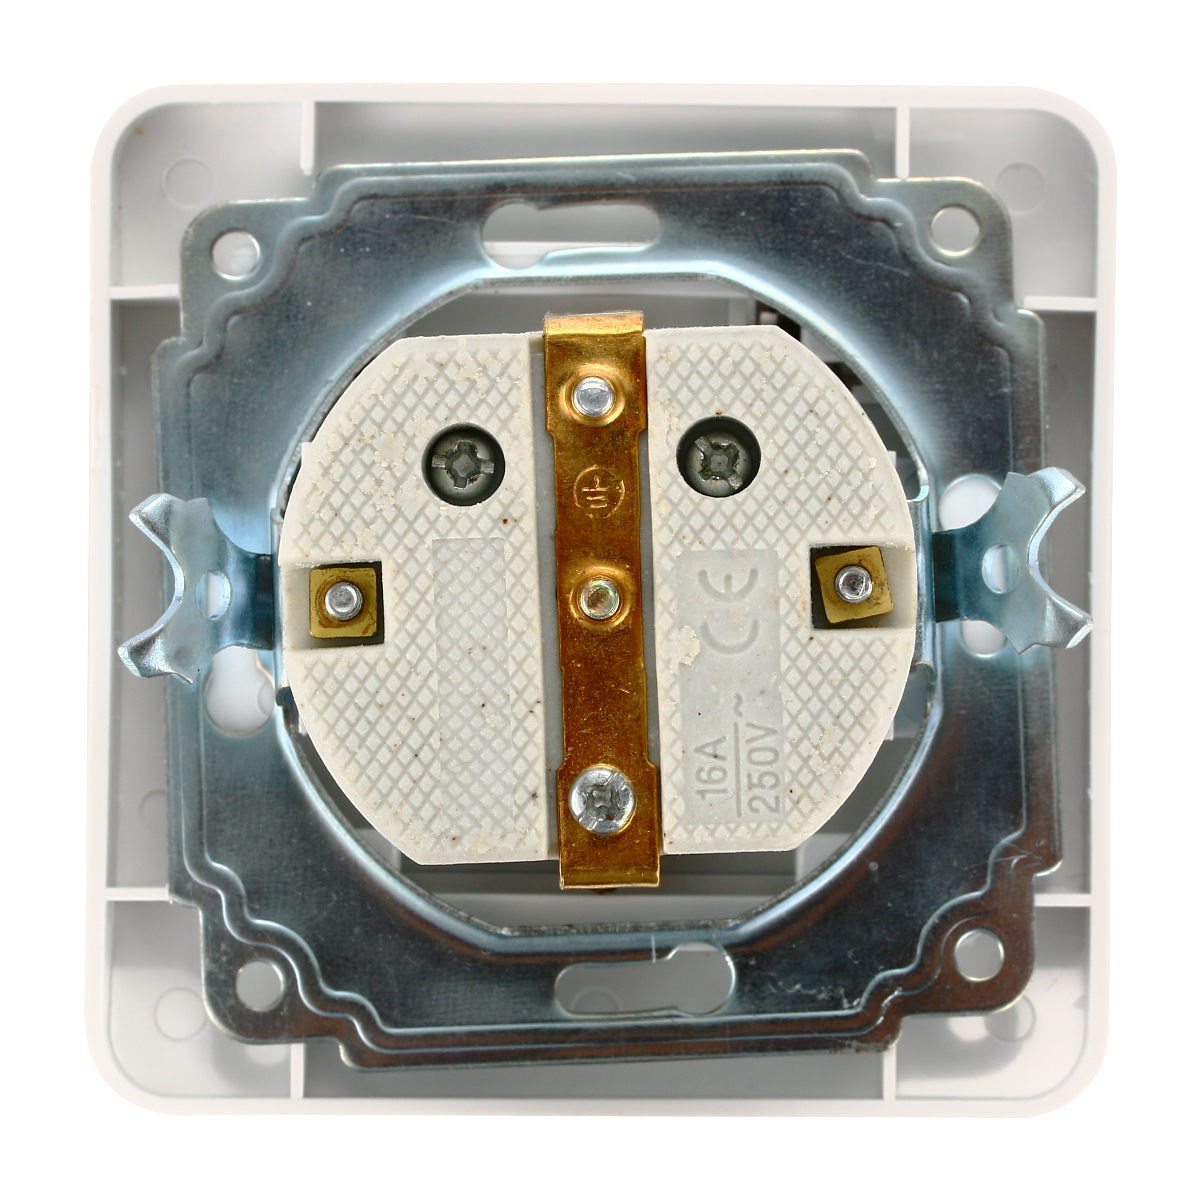 16a 250v korea wiring receptacle power outlet schuko germany european ac power socket bi132